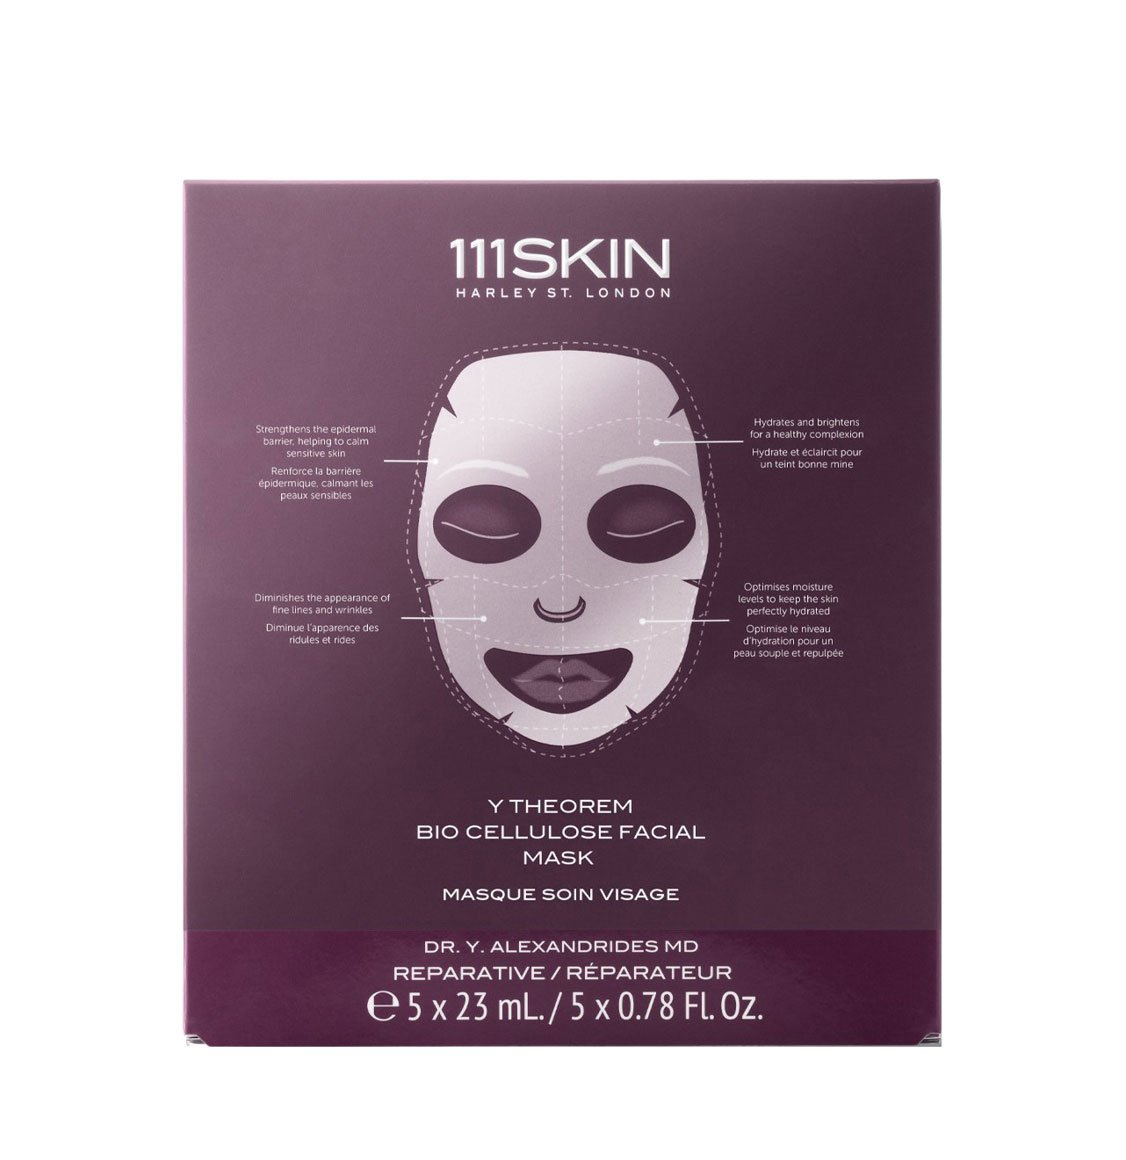 111Skin Y Theorem Bio Cellulose Facial Masks Box 5 x 23ml